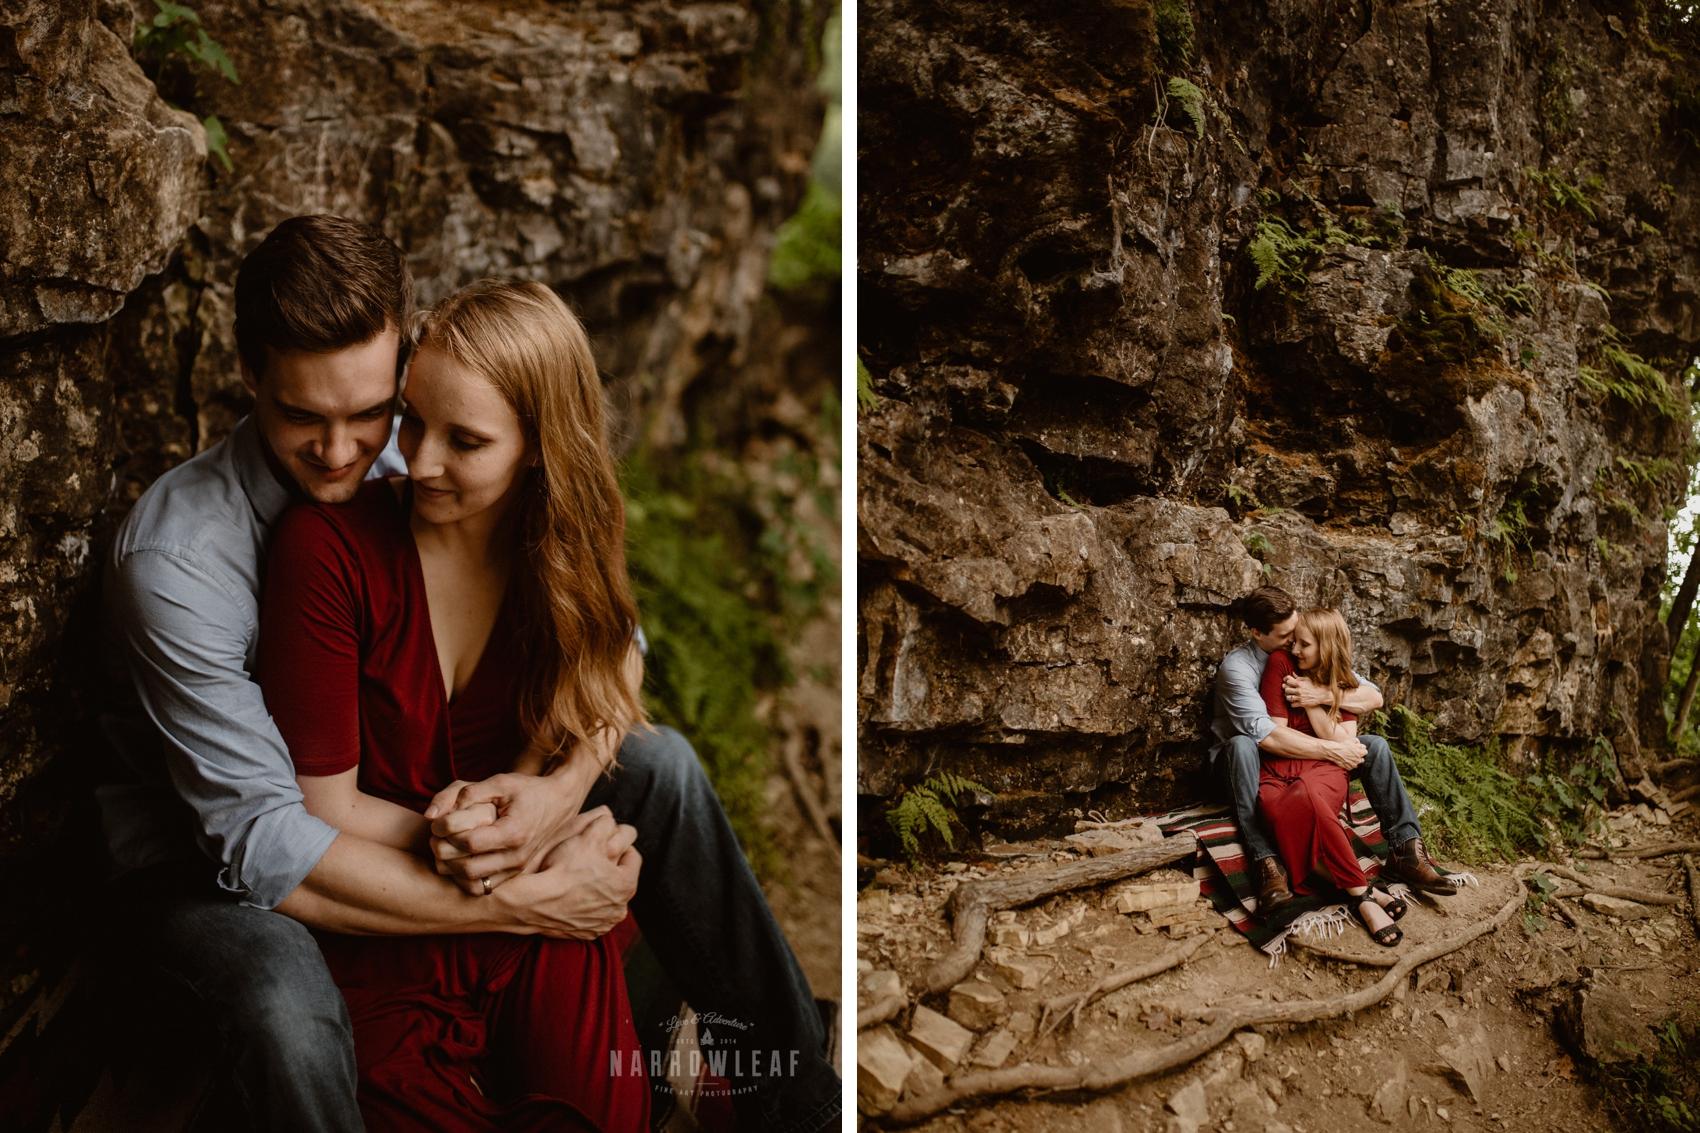 willow-falls-waterfall-adventure-engagement-photographer-003-004.jpg